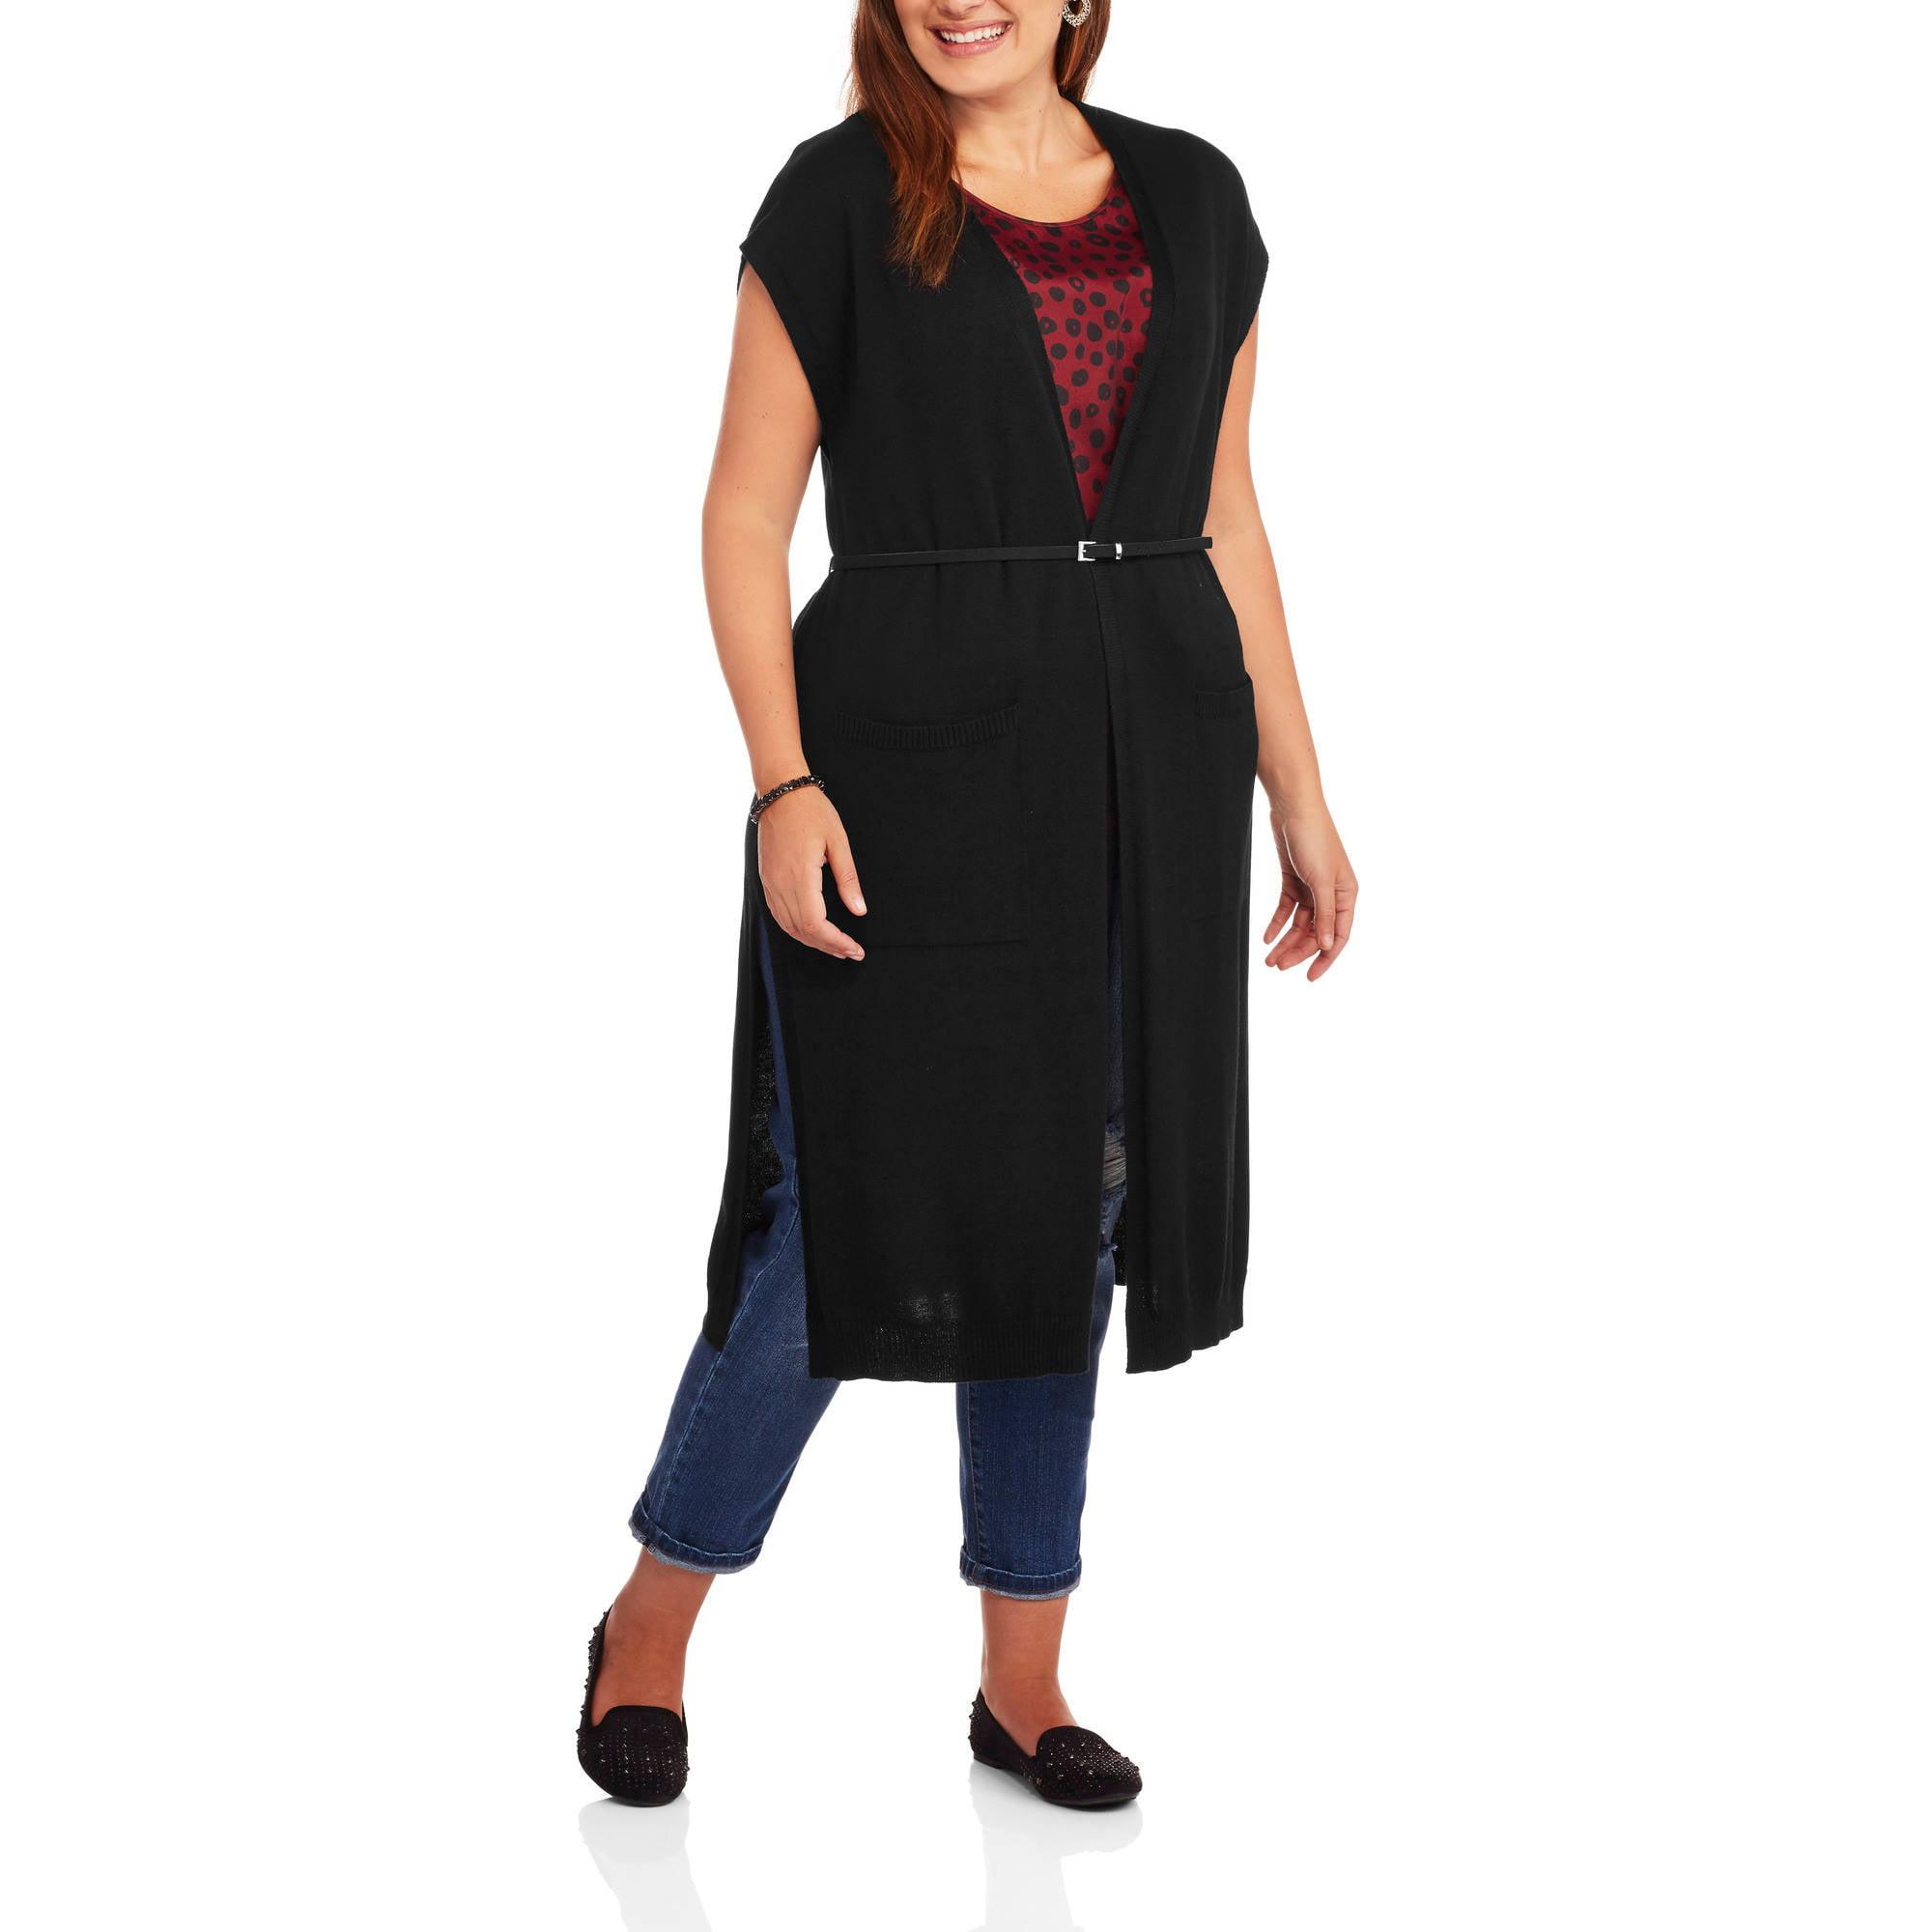 Heart and Crush Women's Plus Long Sleeveless Cardigan Sweater with Belt